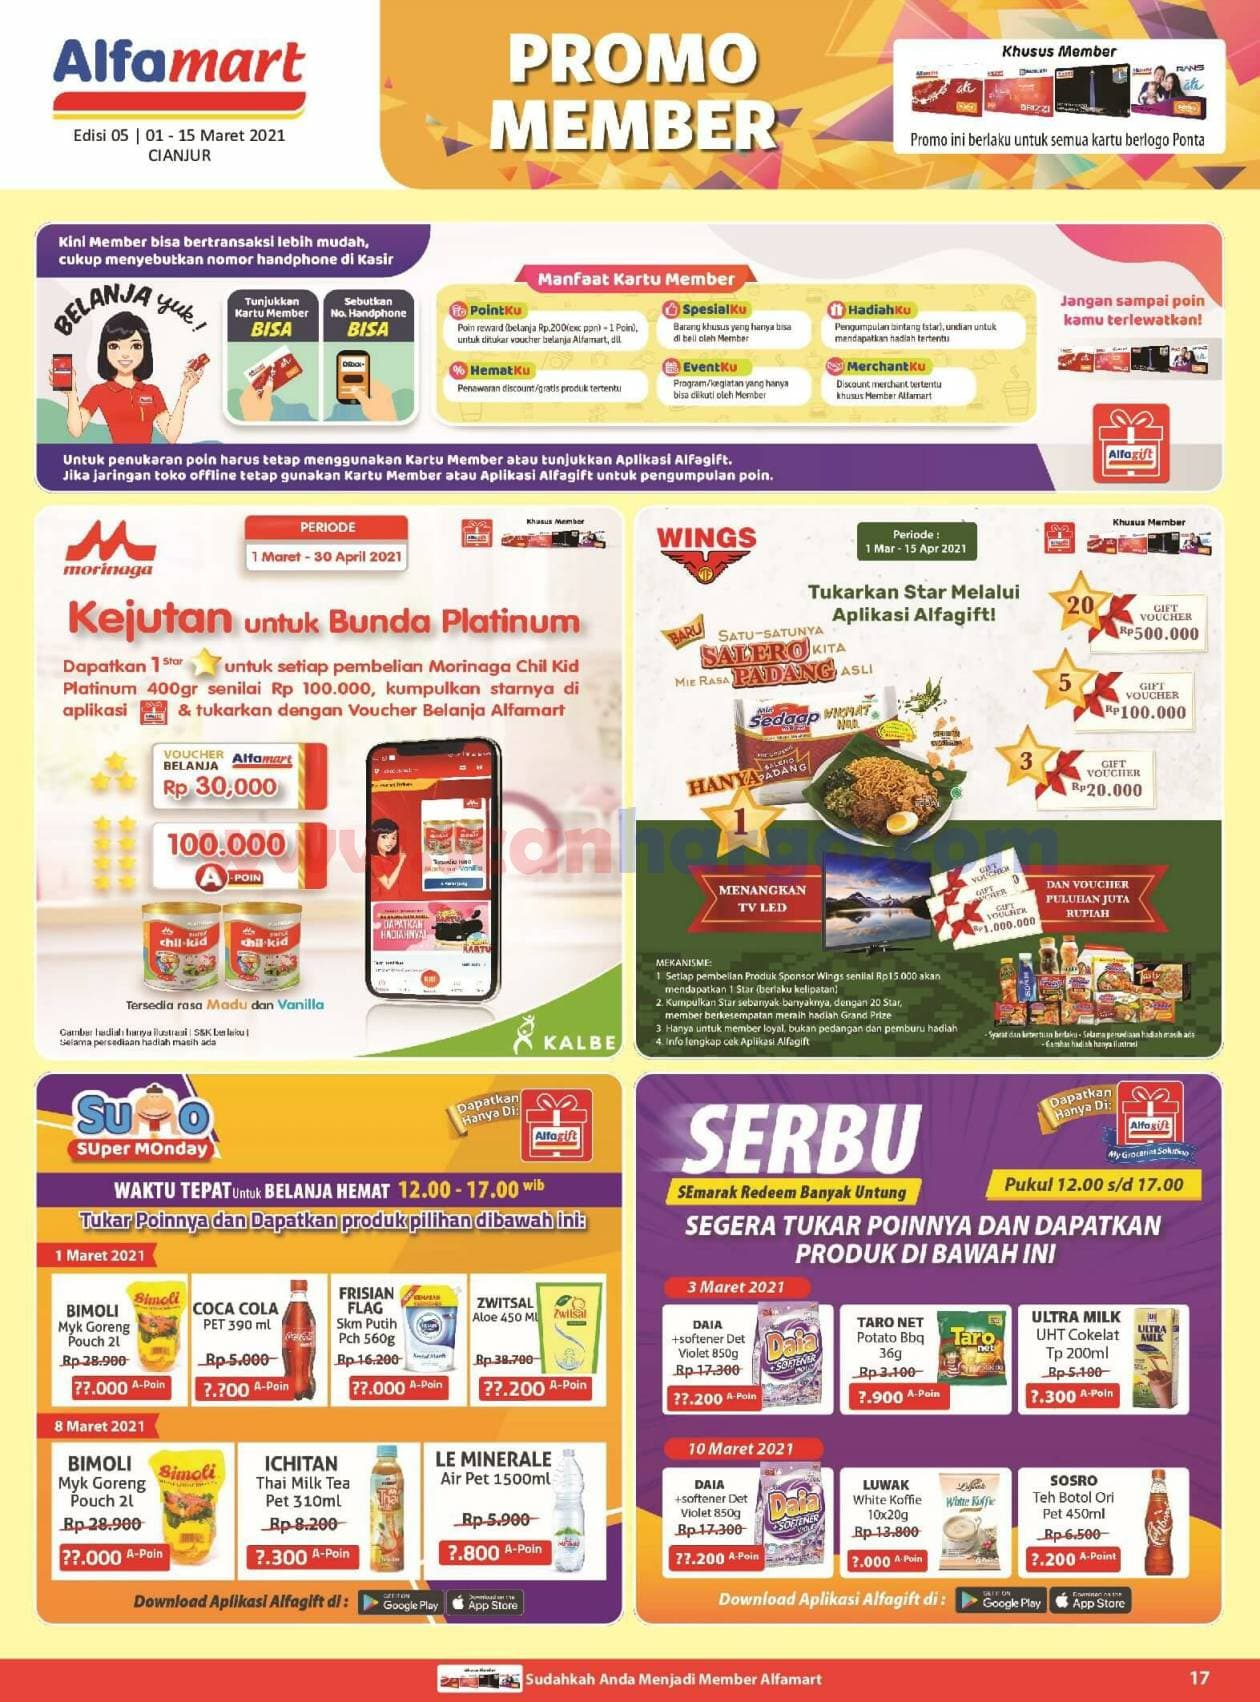 Katalog Promo Alfamart 1 - 15 Maret 2021 17